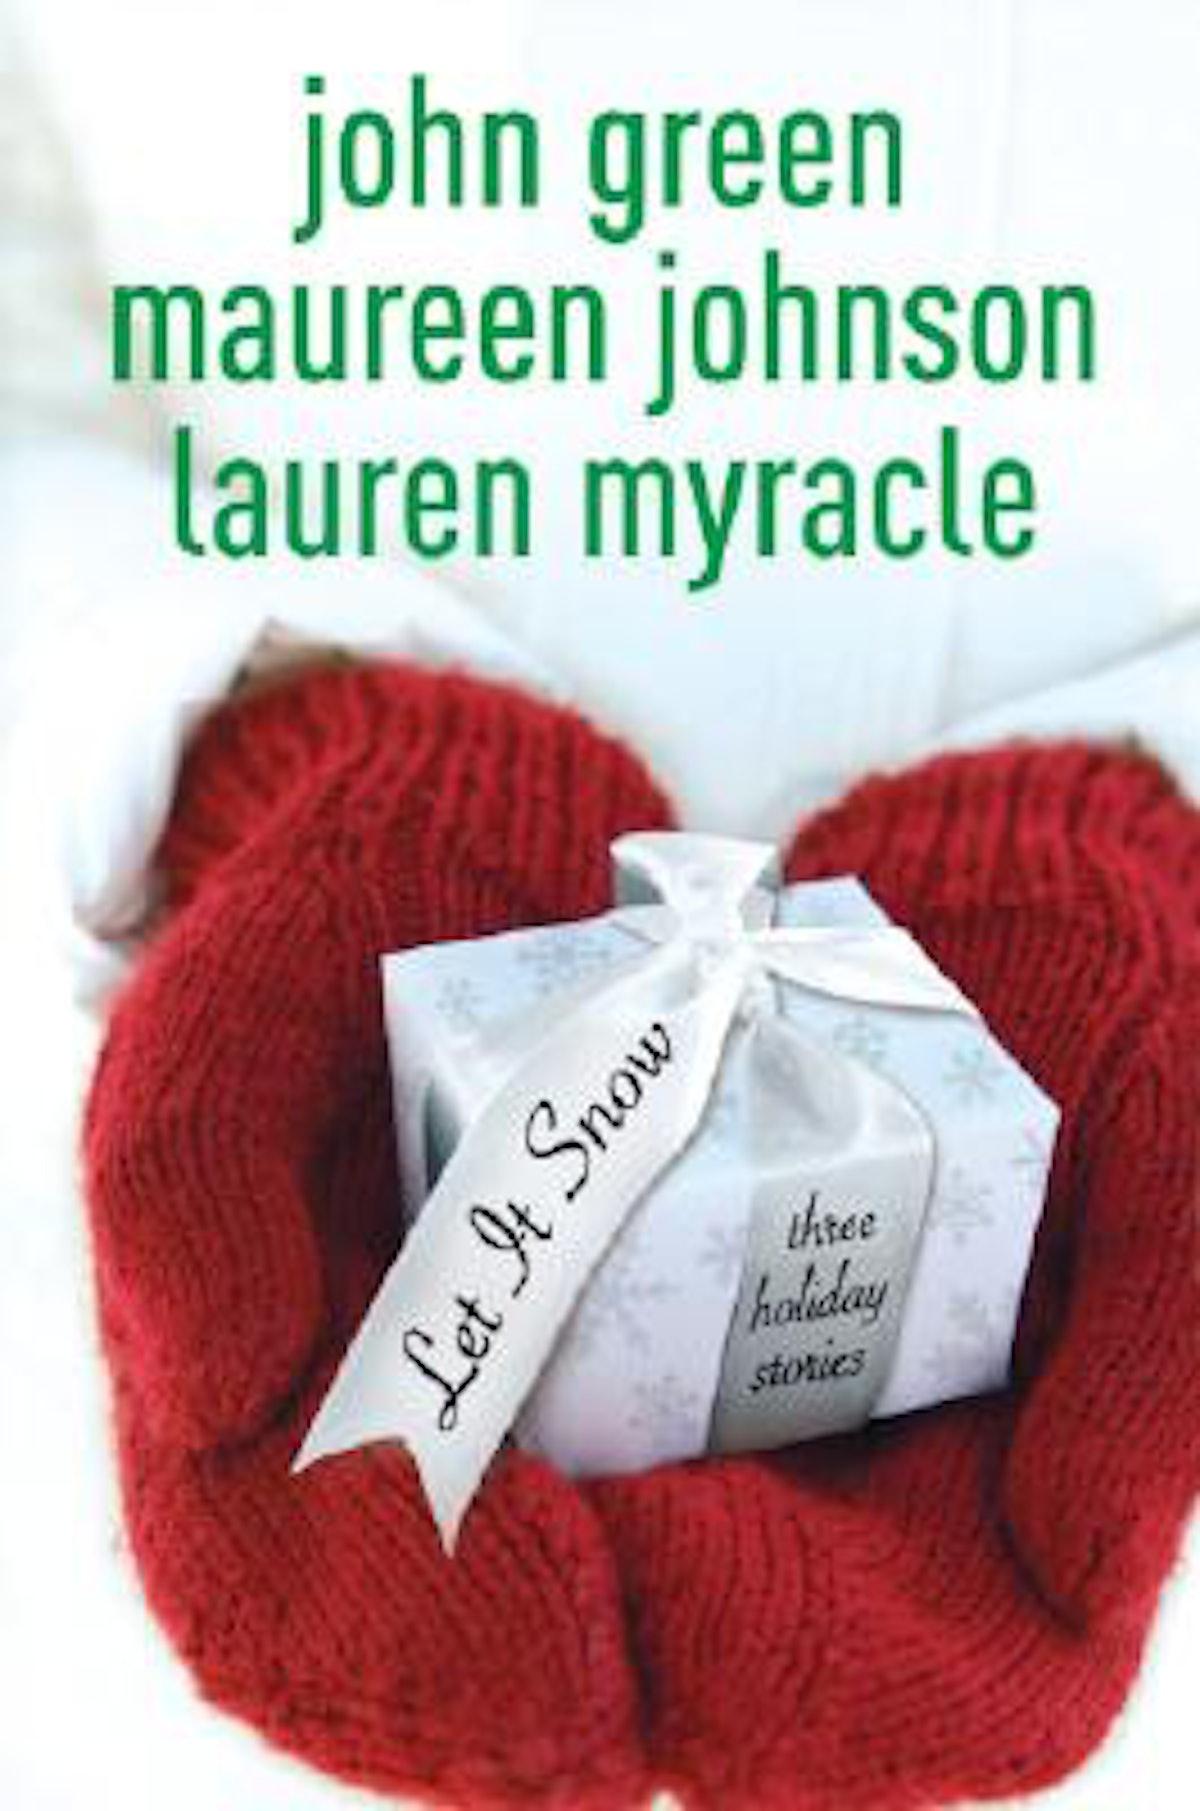 'Let It Snow' by John Green, Maureen Johnson, and Lauren Myracle